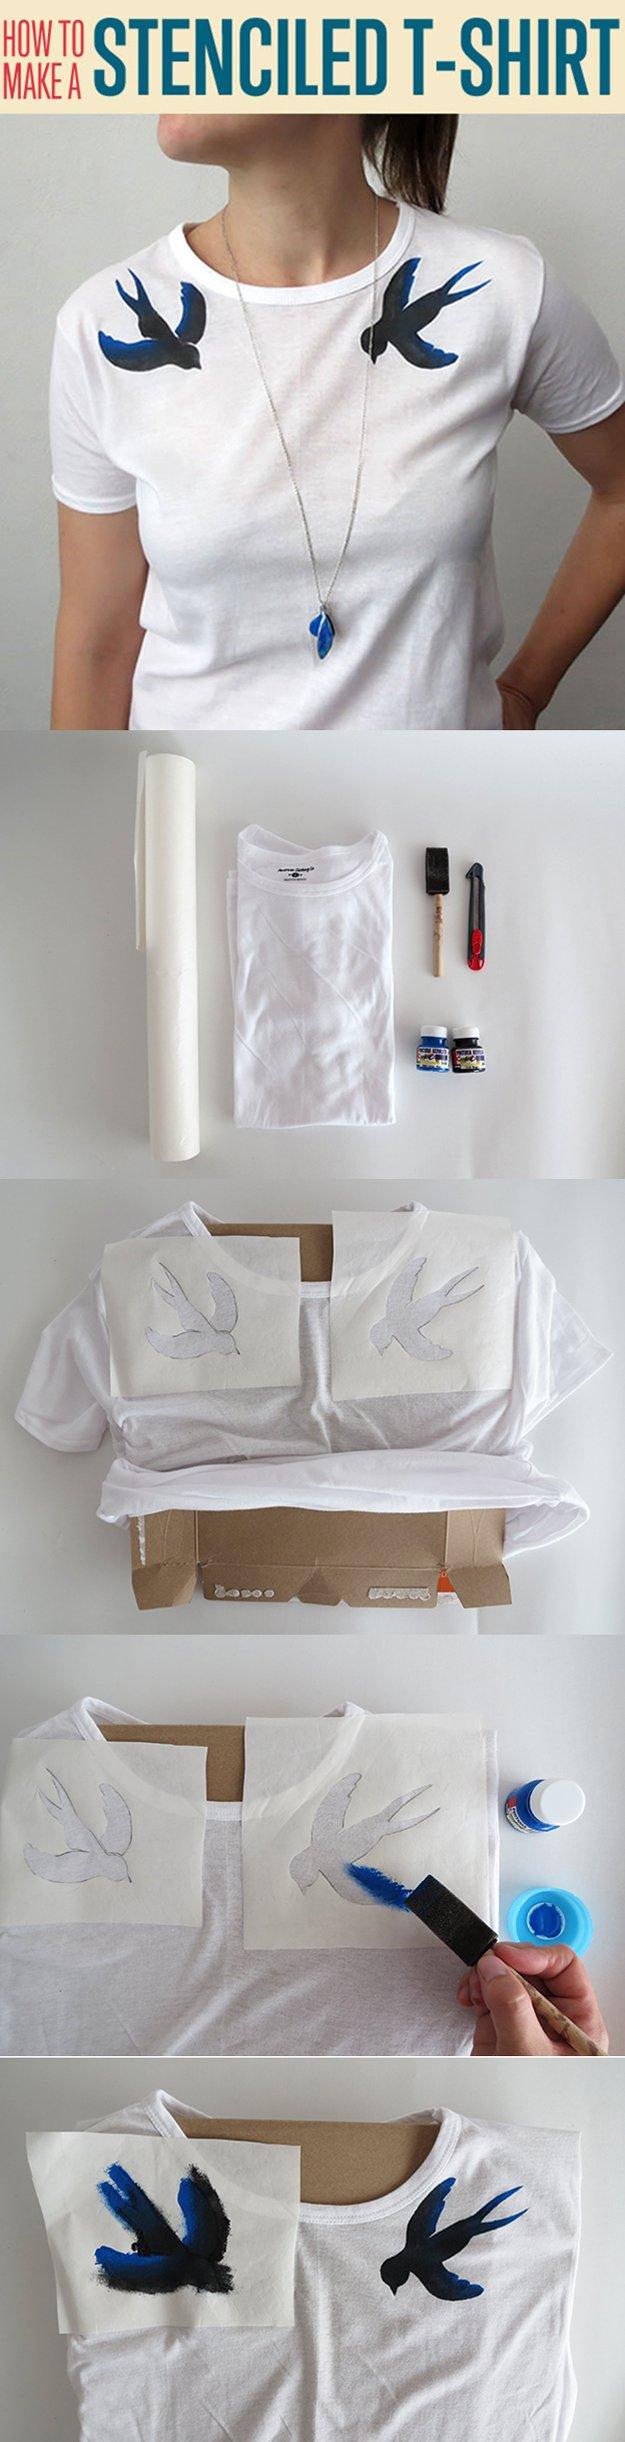 Simple DIY Top Design for Women | diyready.com/diy-clothes-sewing-blouses-tutorial/